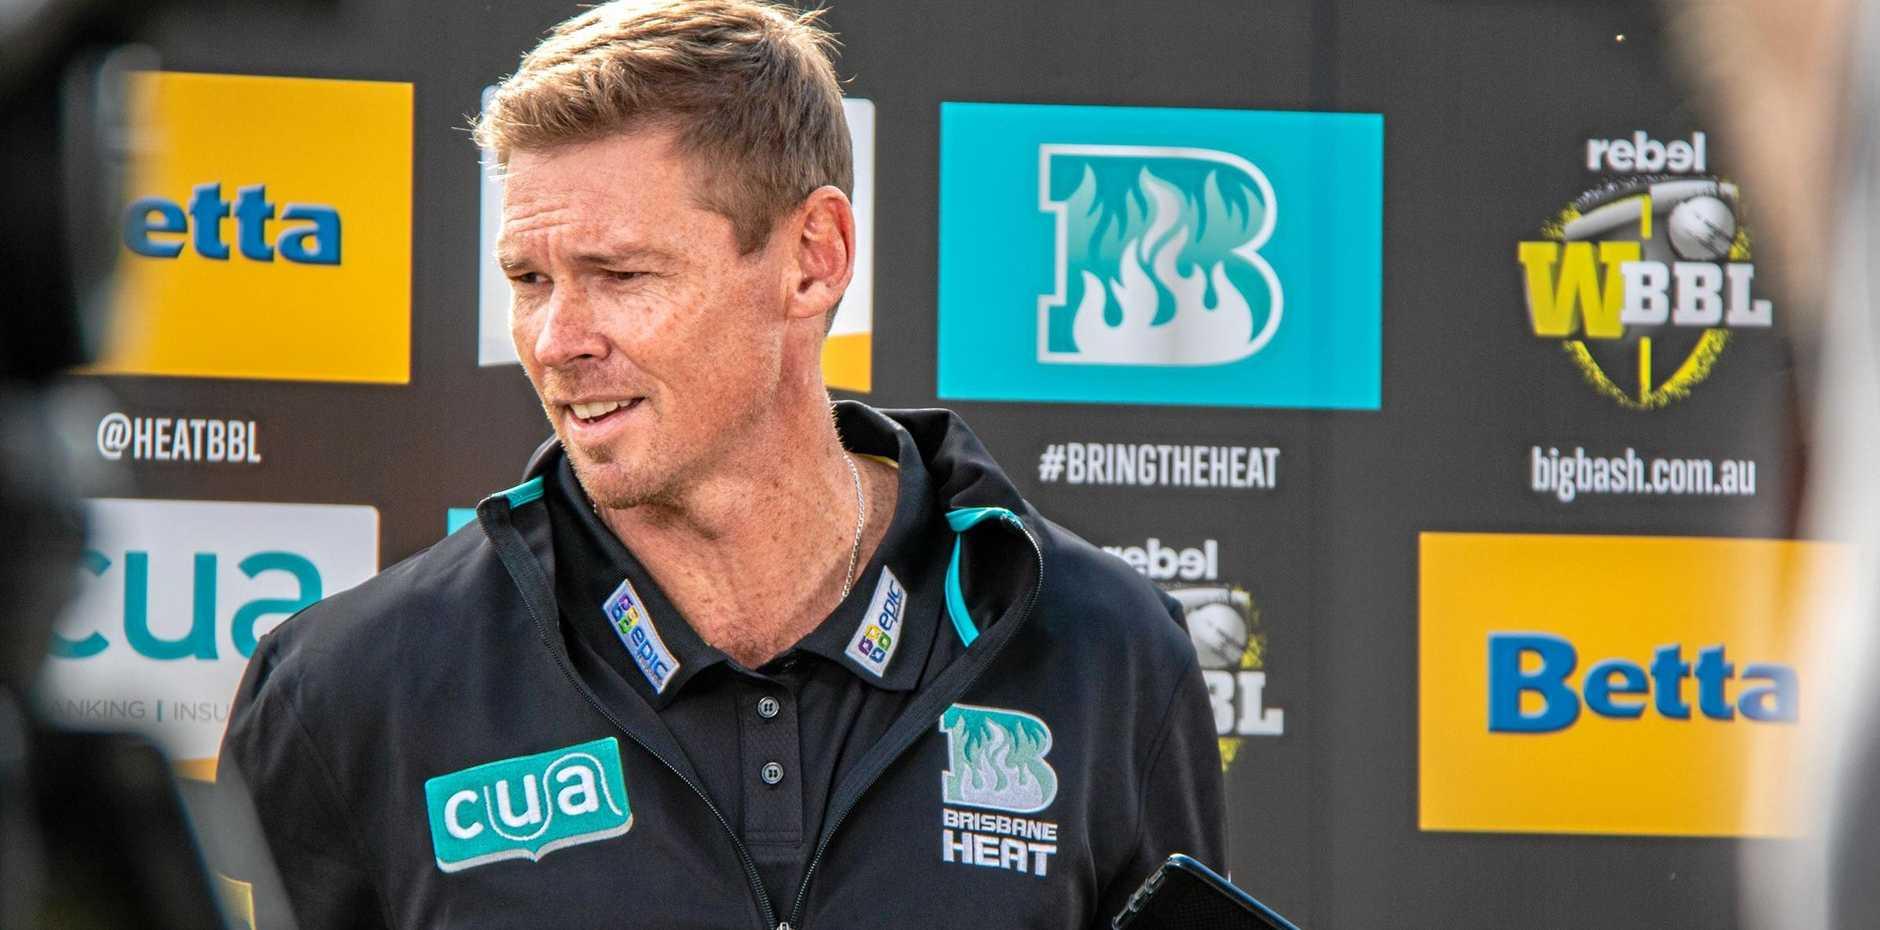 WBBL championship Brisbane Heat has appointed Sunshine Coast's Ashley Noffke as its coach